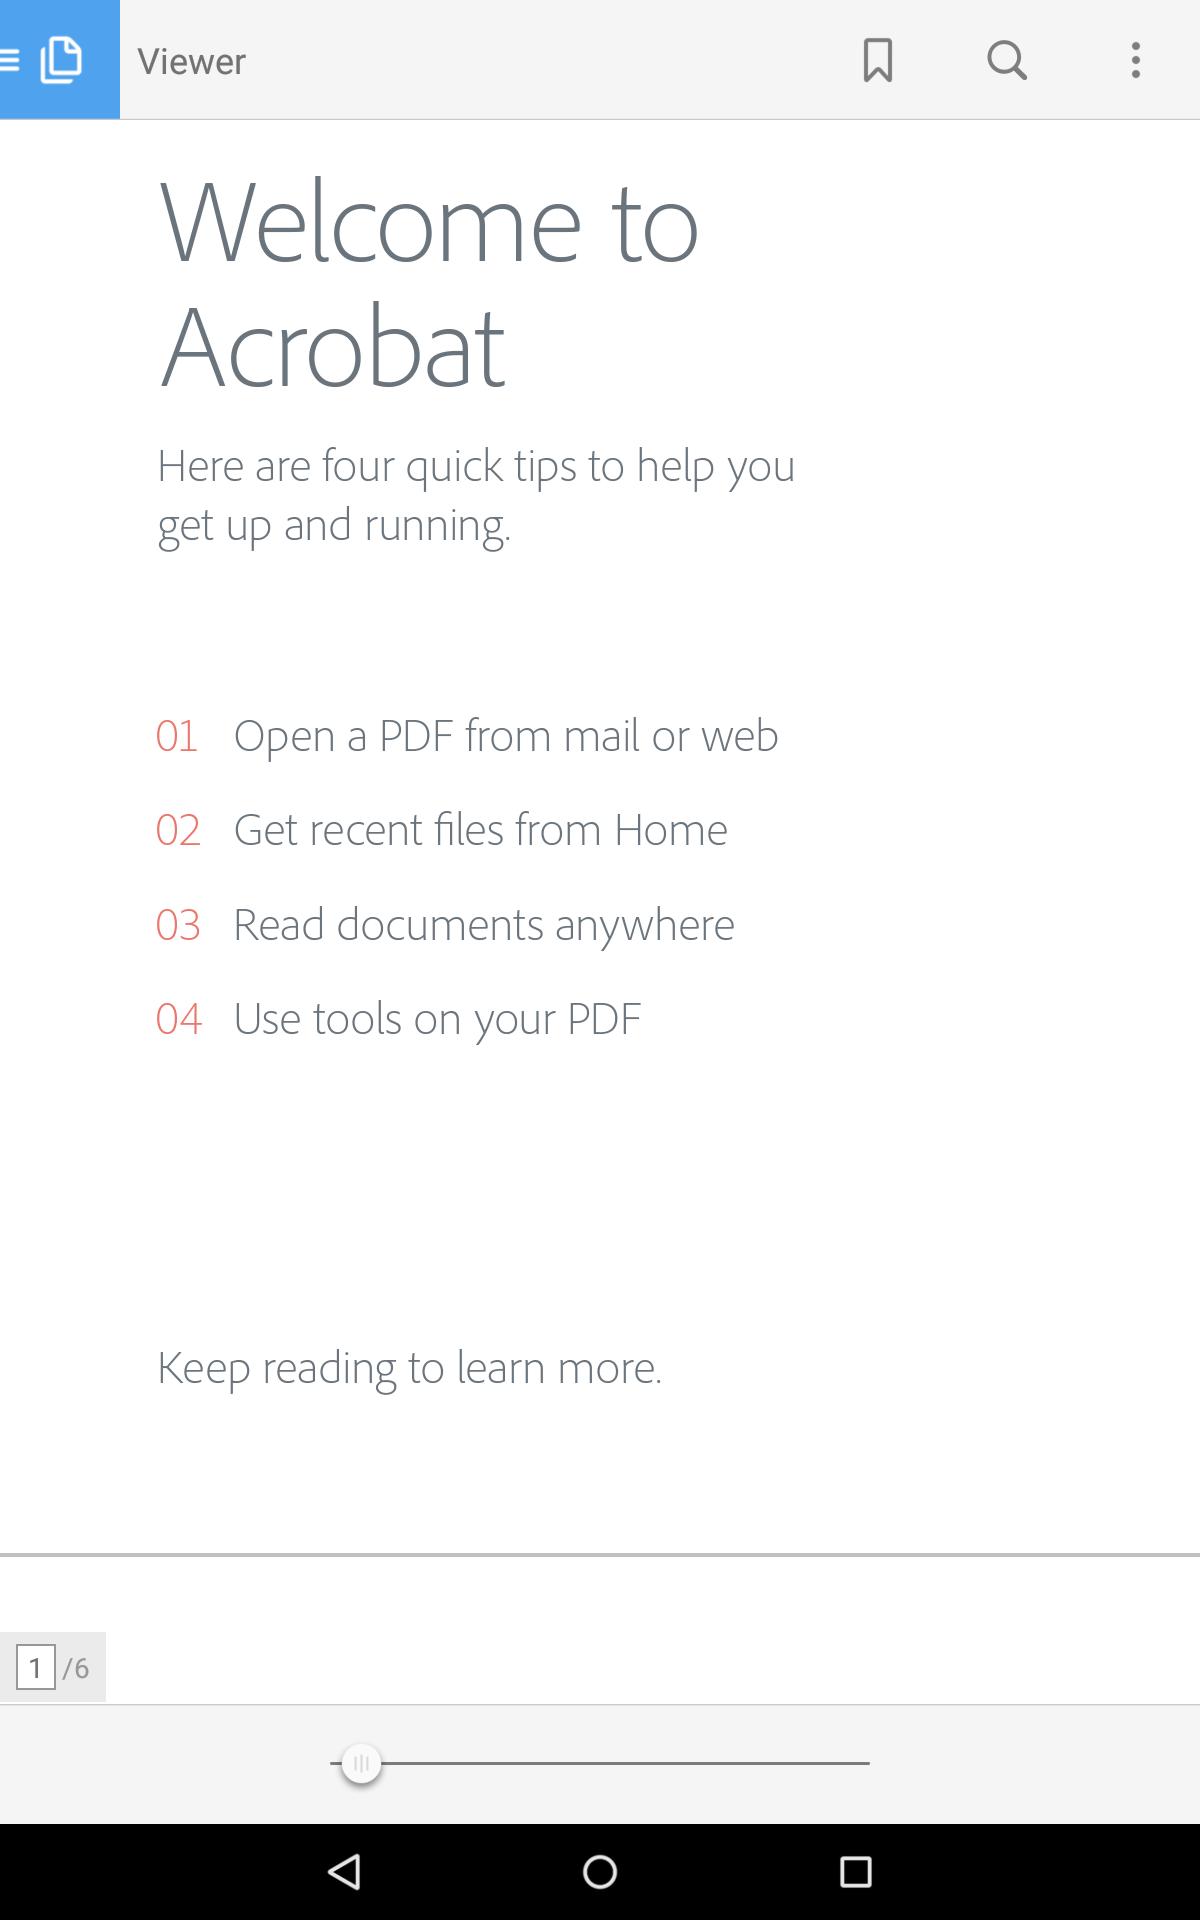 Adobe Reader Acrobat Document Cloud, Android App